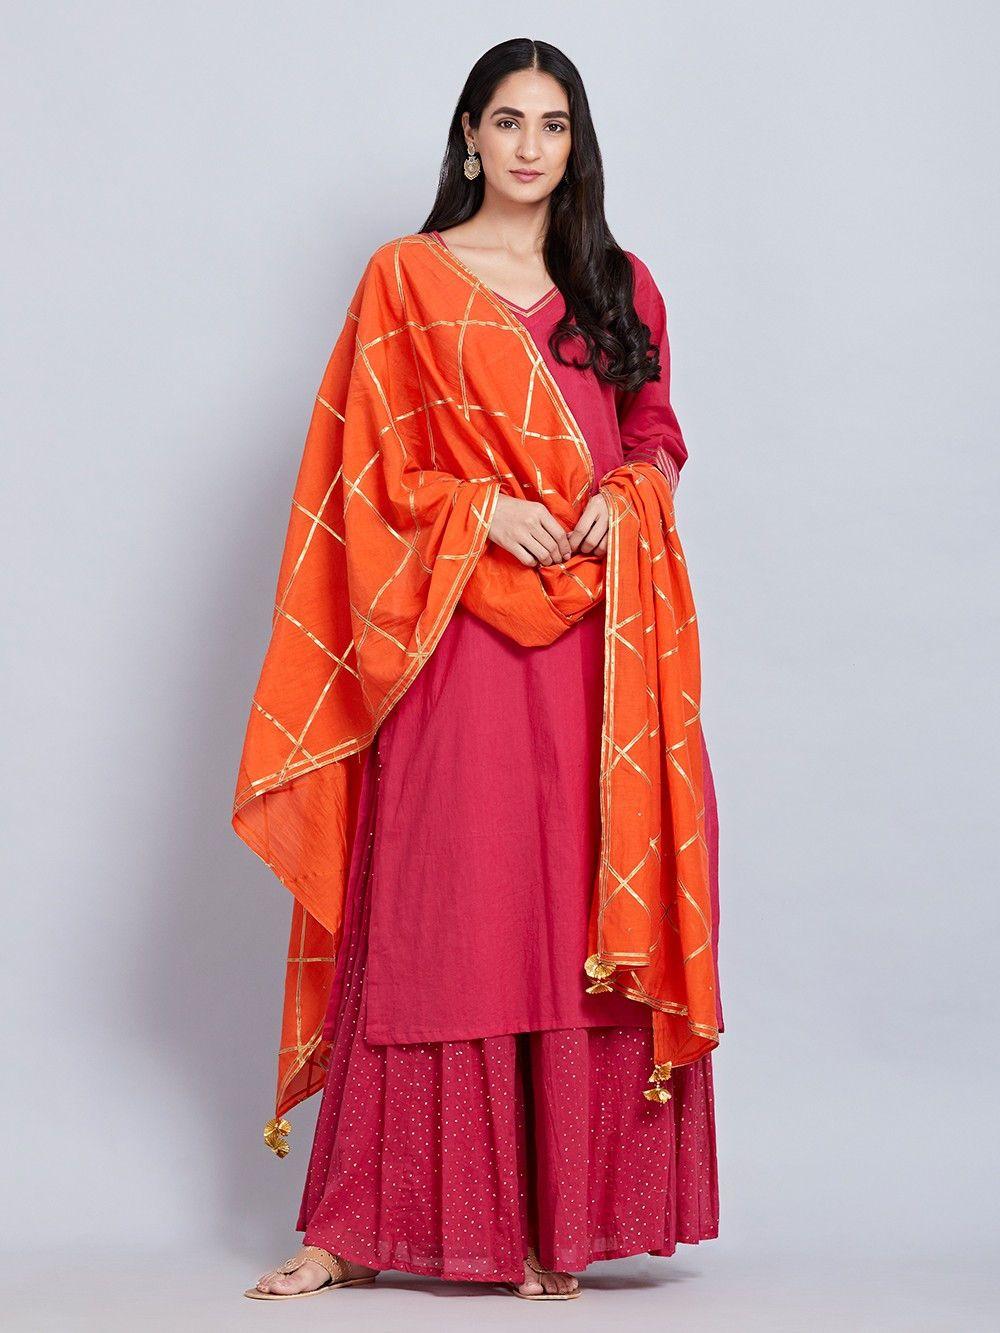 22a451bf36e85 Buy Pink Cotton Kurta with Hand Block Printed Sharara and Orange Gota  Dupatta - Set of 3 online at Theloom